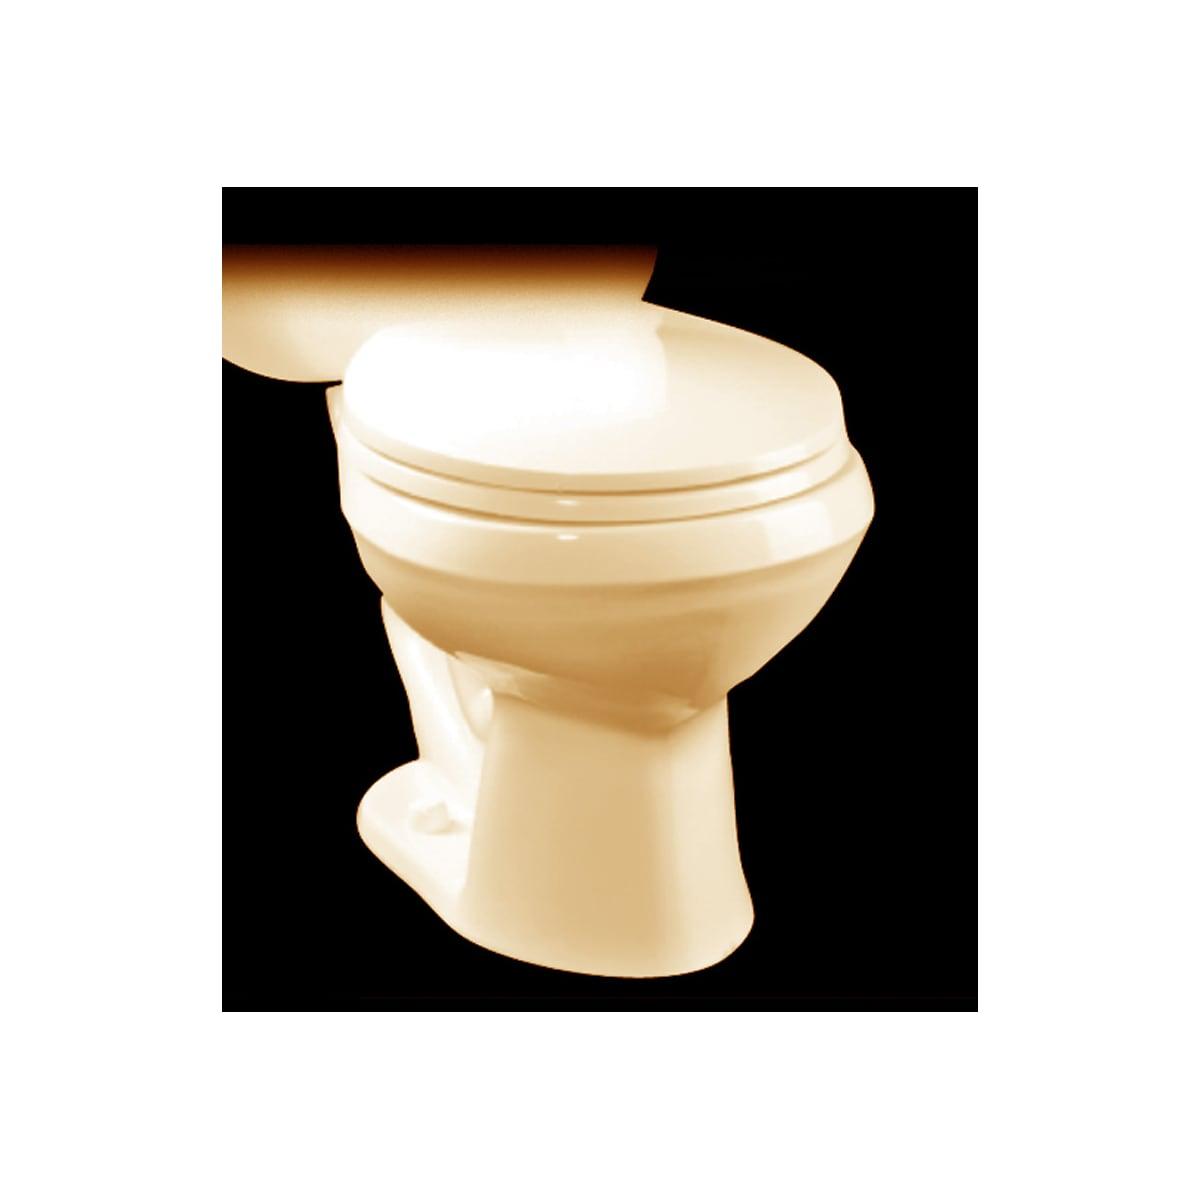 Outstanding Proflo Pf1203Wh White Elongated Toilet Bowl Only With 12 Inzonedesignstudio Interior Chair Design Inzonedesignstudiocom